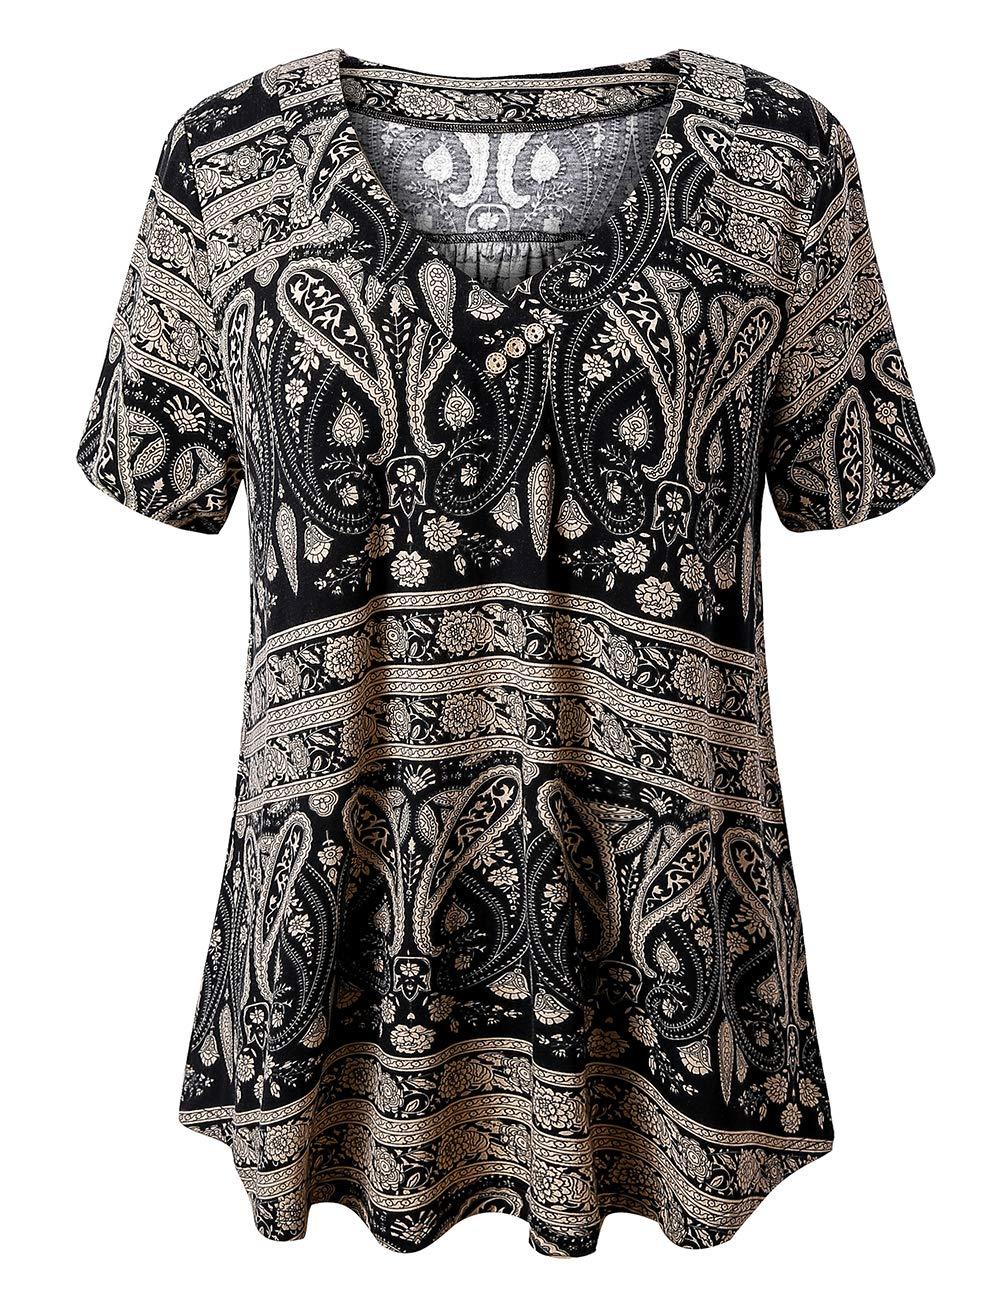 U.Vomade Women's Plus Size Tops Short Sleeve Blouses Flowy Summer Tunic Tops M-4X.